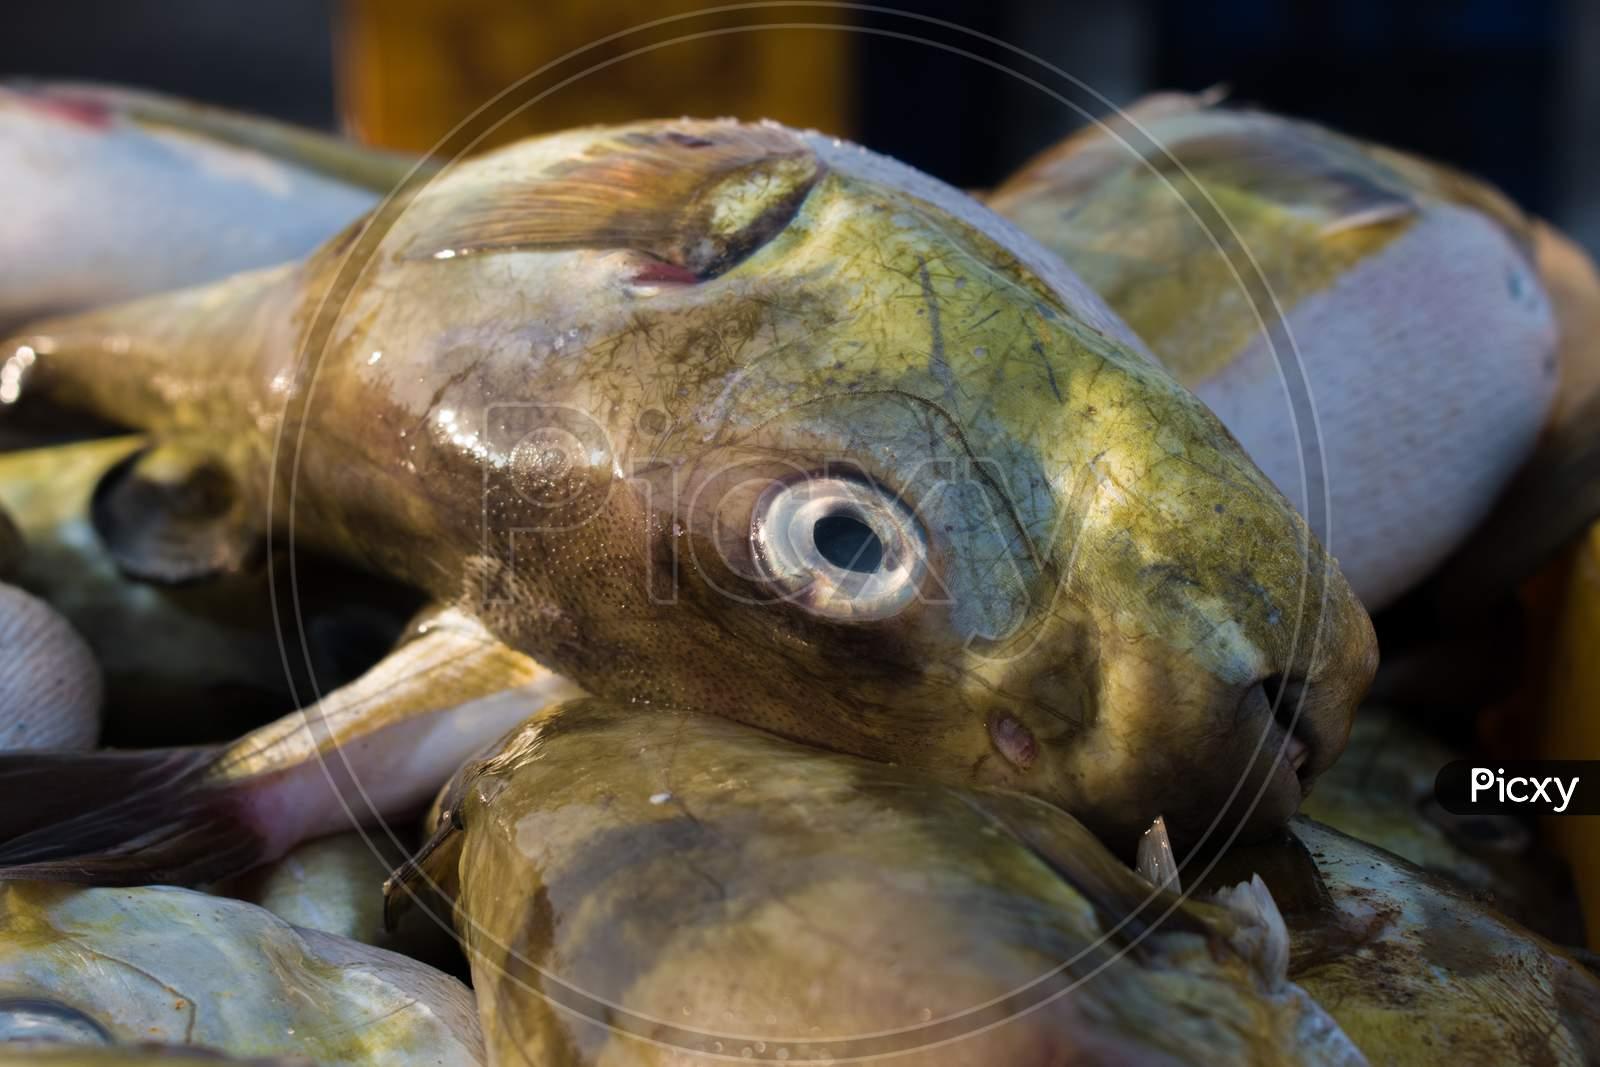 Smoothback Pufferfish (Lagocephalus Inermis) For Sale In The Fish Market In Mangalore Harbour, Karnataka.